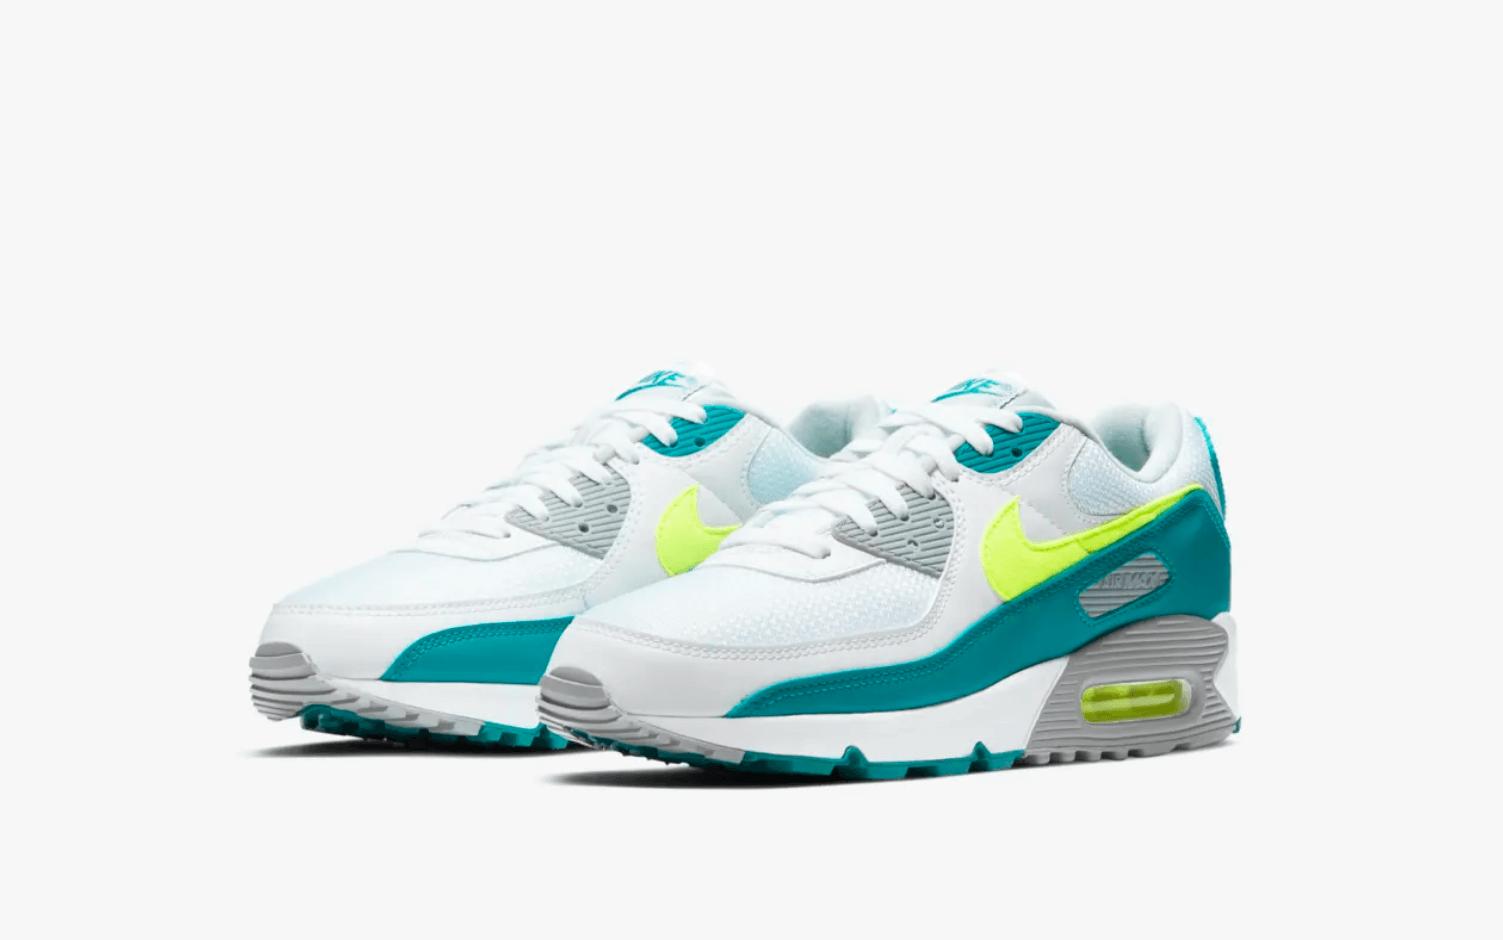 zapatillas Nike Air Max 90 Hot Lime 2021